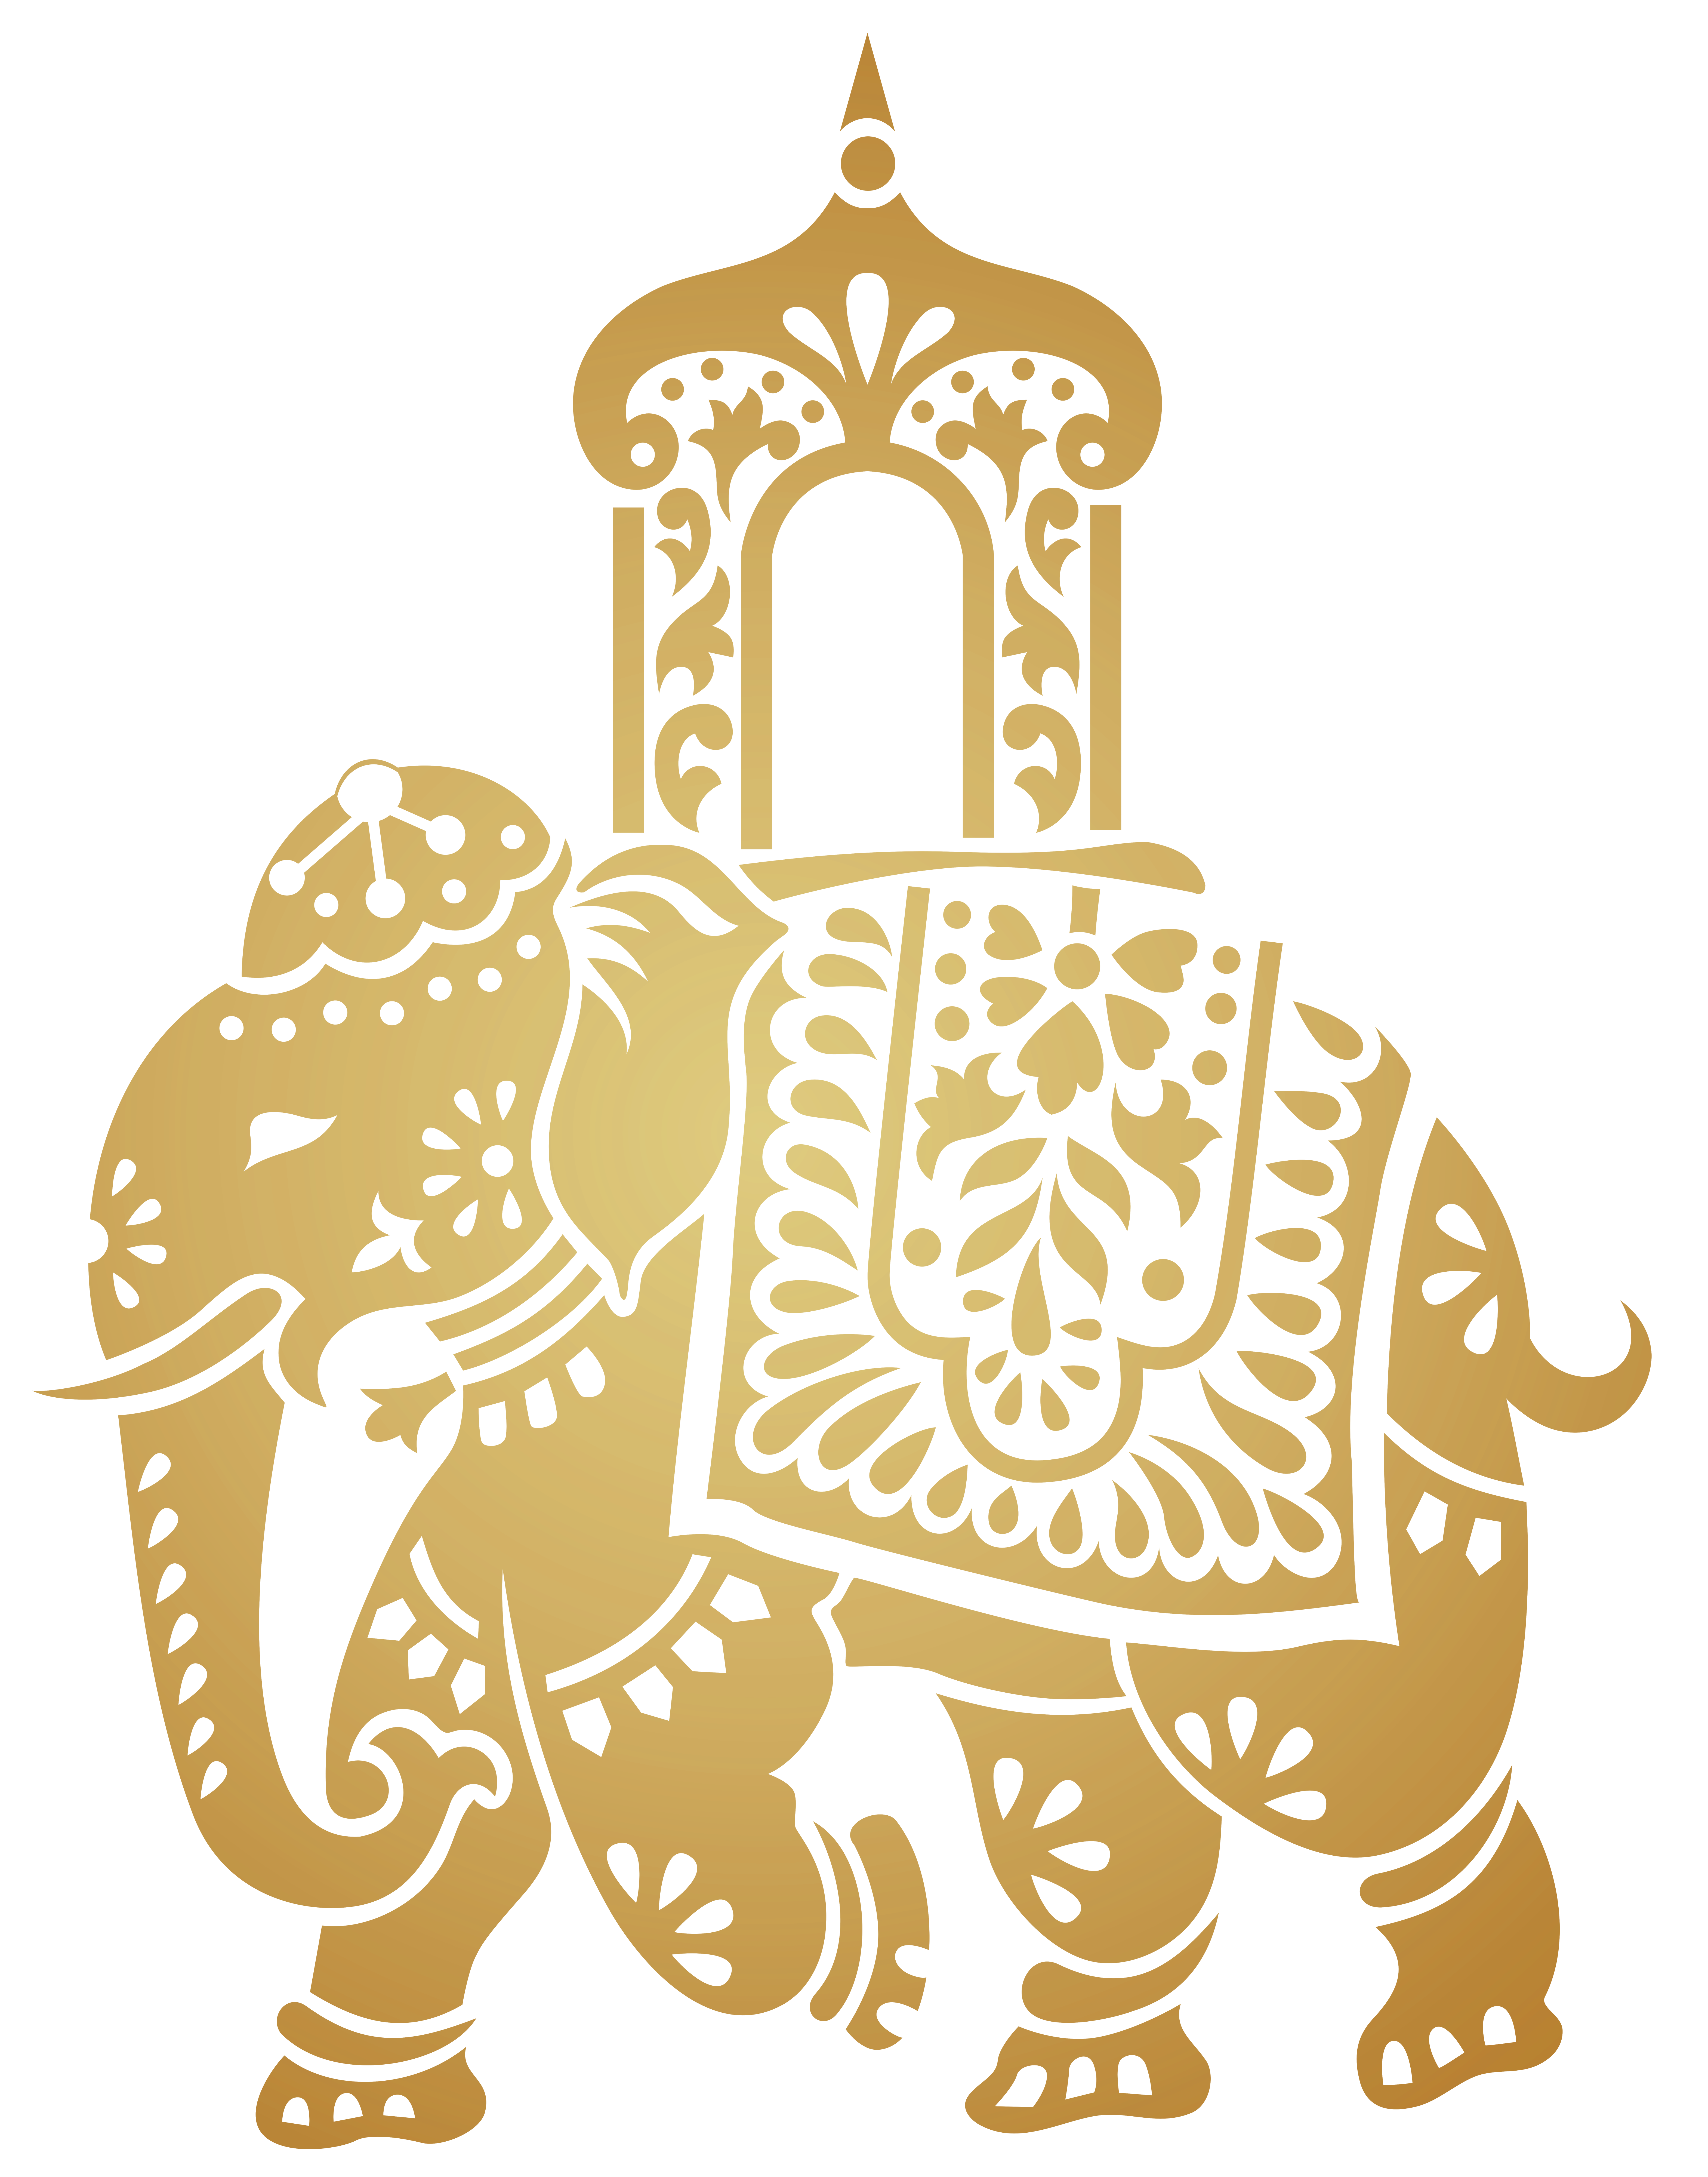 Asian flower clipart clipart freeuse Decorative Indian Elephant Transparent Clip Art Image clipart freeuse